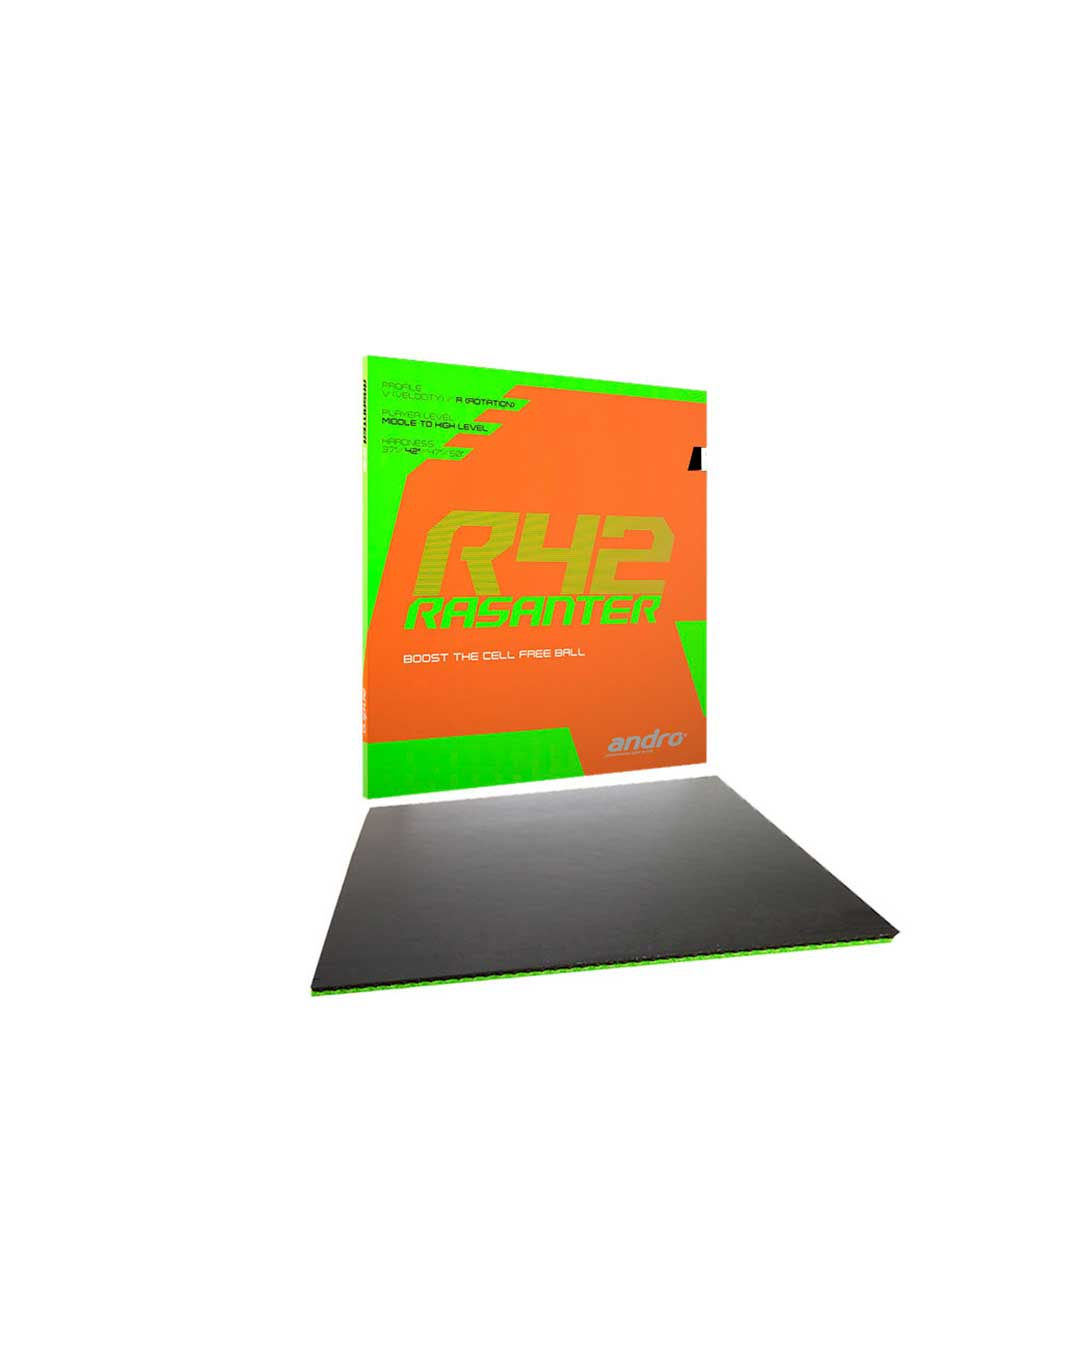 Goma Tenis de Mesa Andro Rasanter R42 Black Ultramax